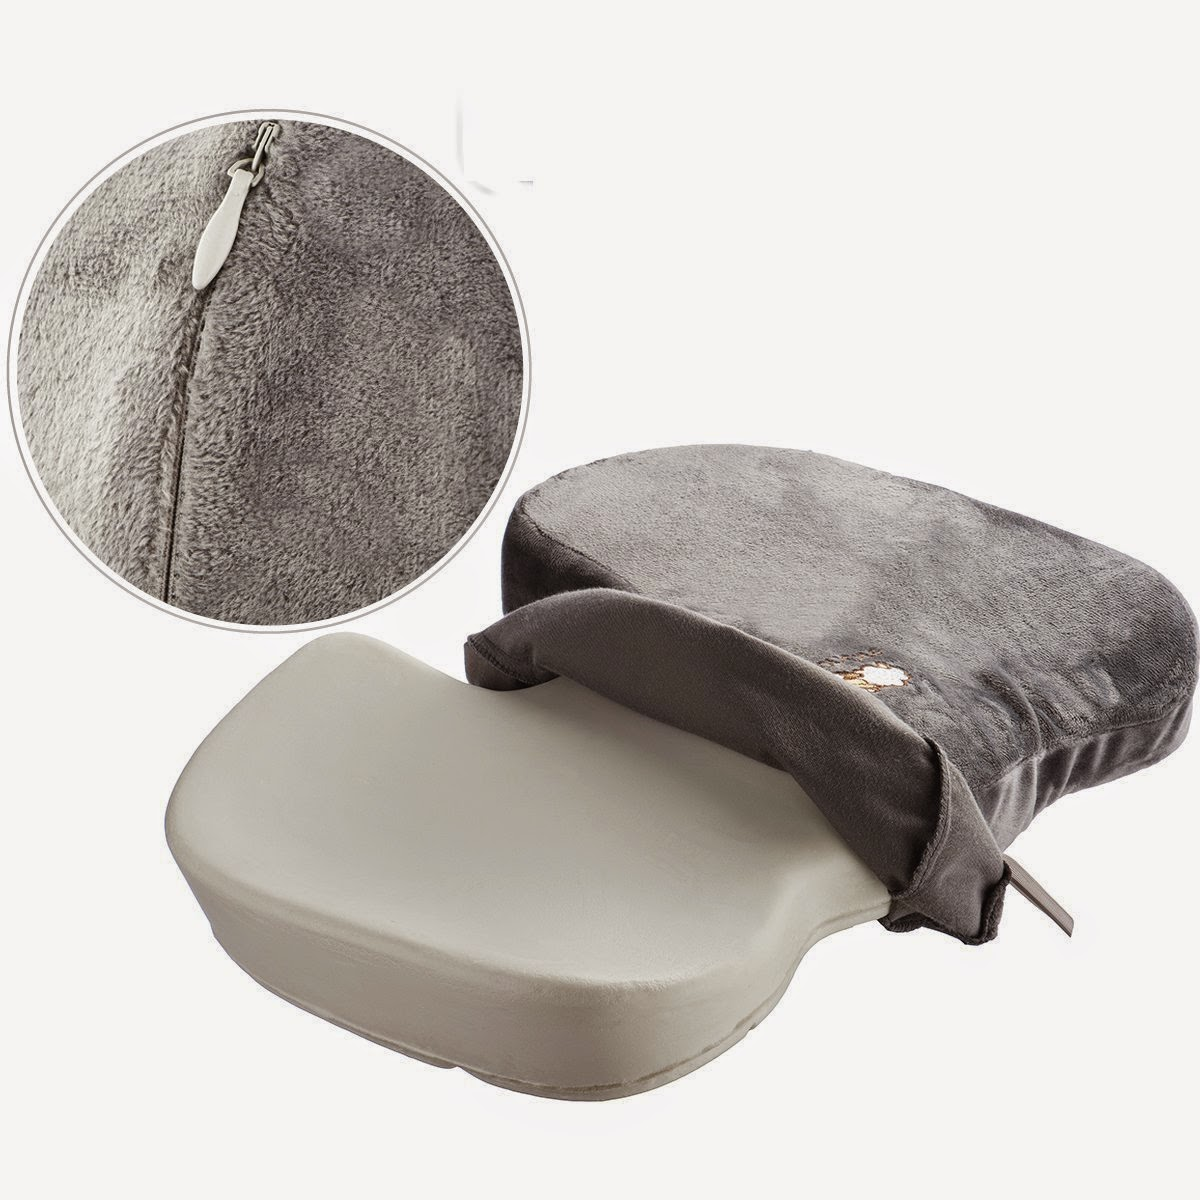 CushionCare Memory Foam Seat Cushion #CushionCarePromotion